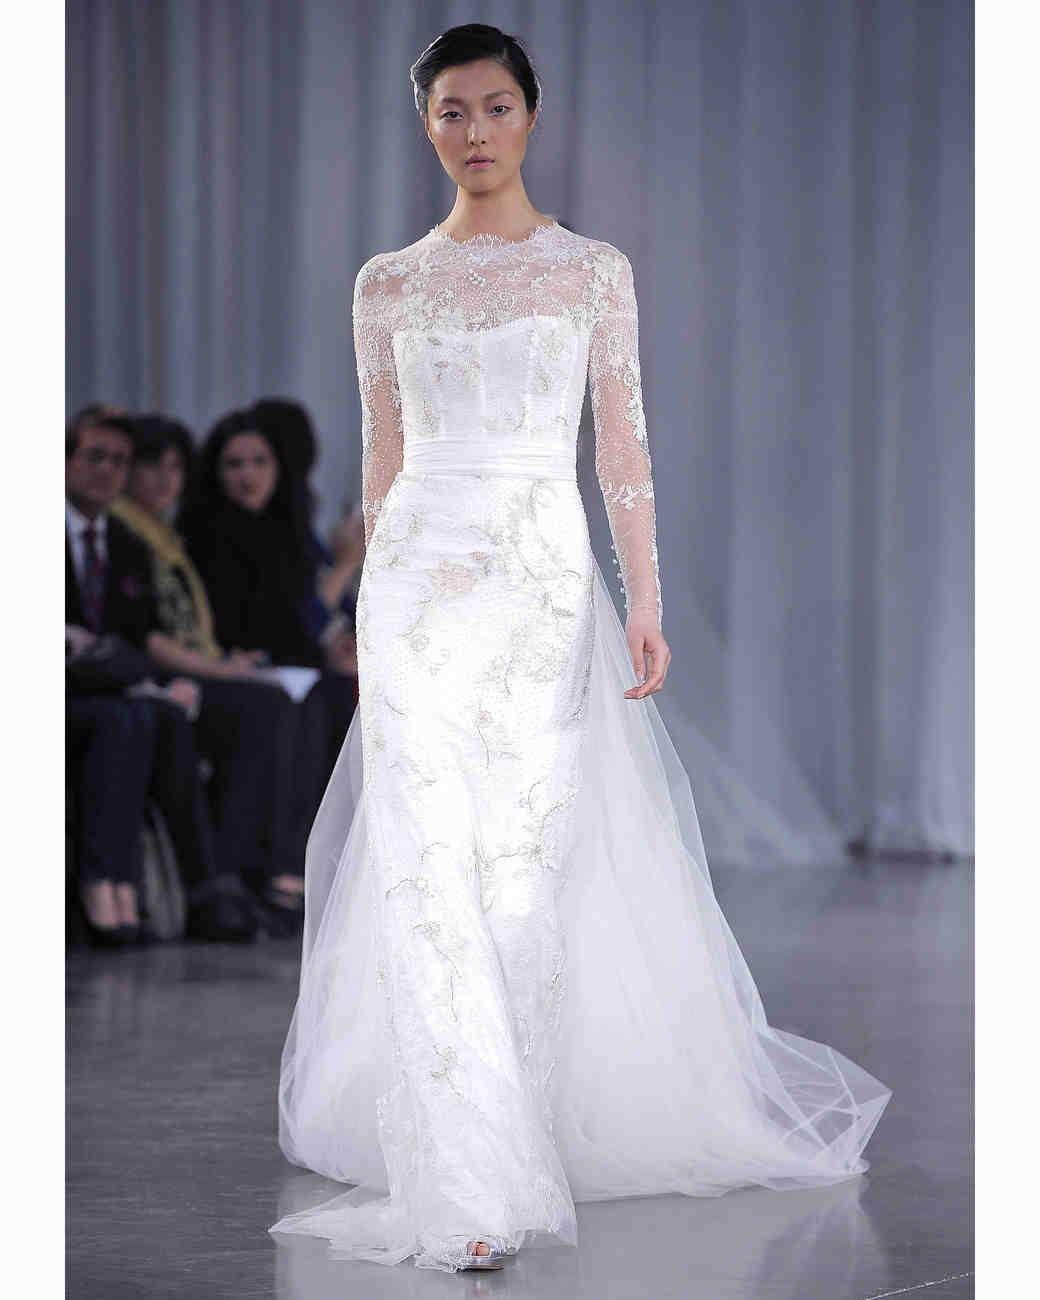 Long Sleeve Wedding Dresses Fall 2013